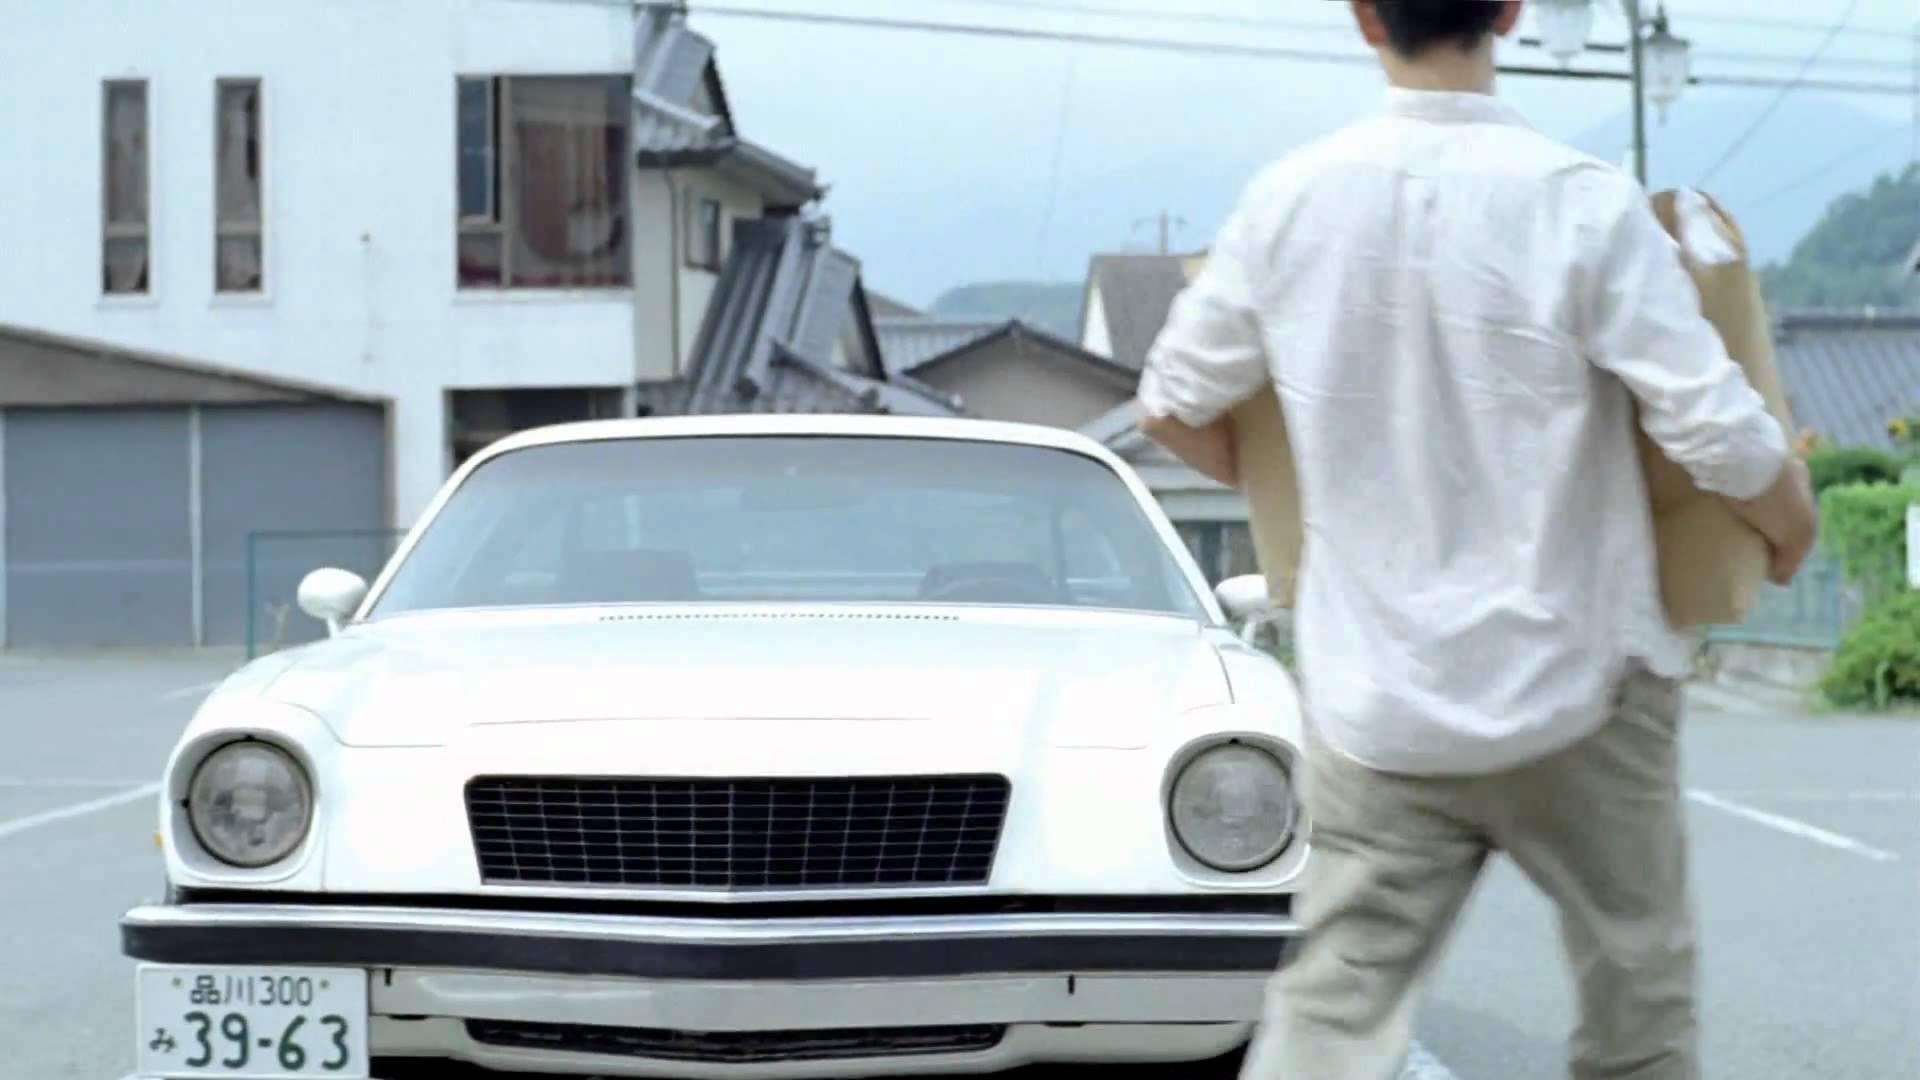 Daihatsu 企業cm 日本某地的新城鎮 篇 繁中 The Originals